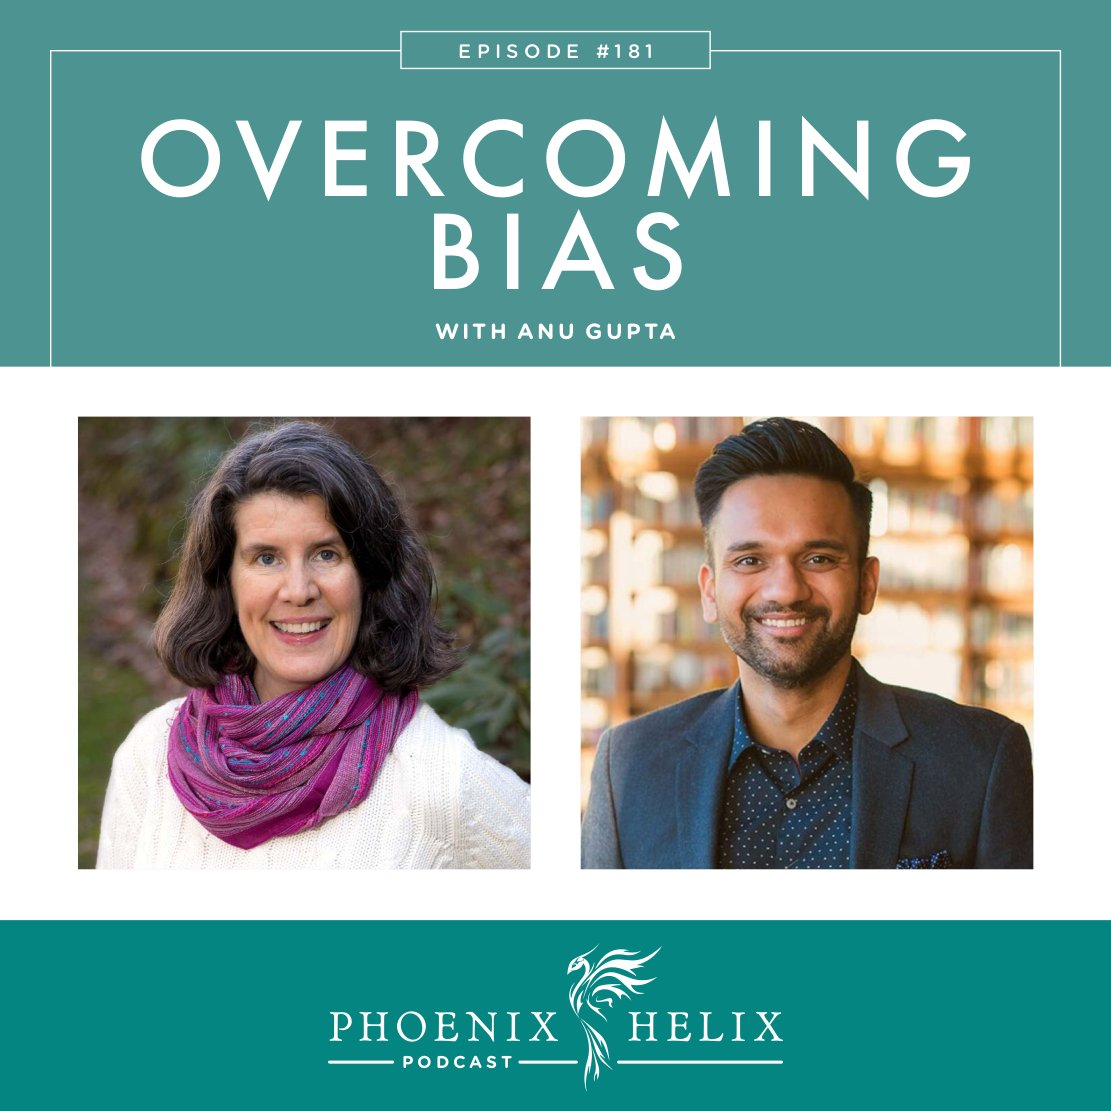 Overcoming Bias with Anu Gupta   Phoenix Helix Podcast